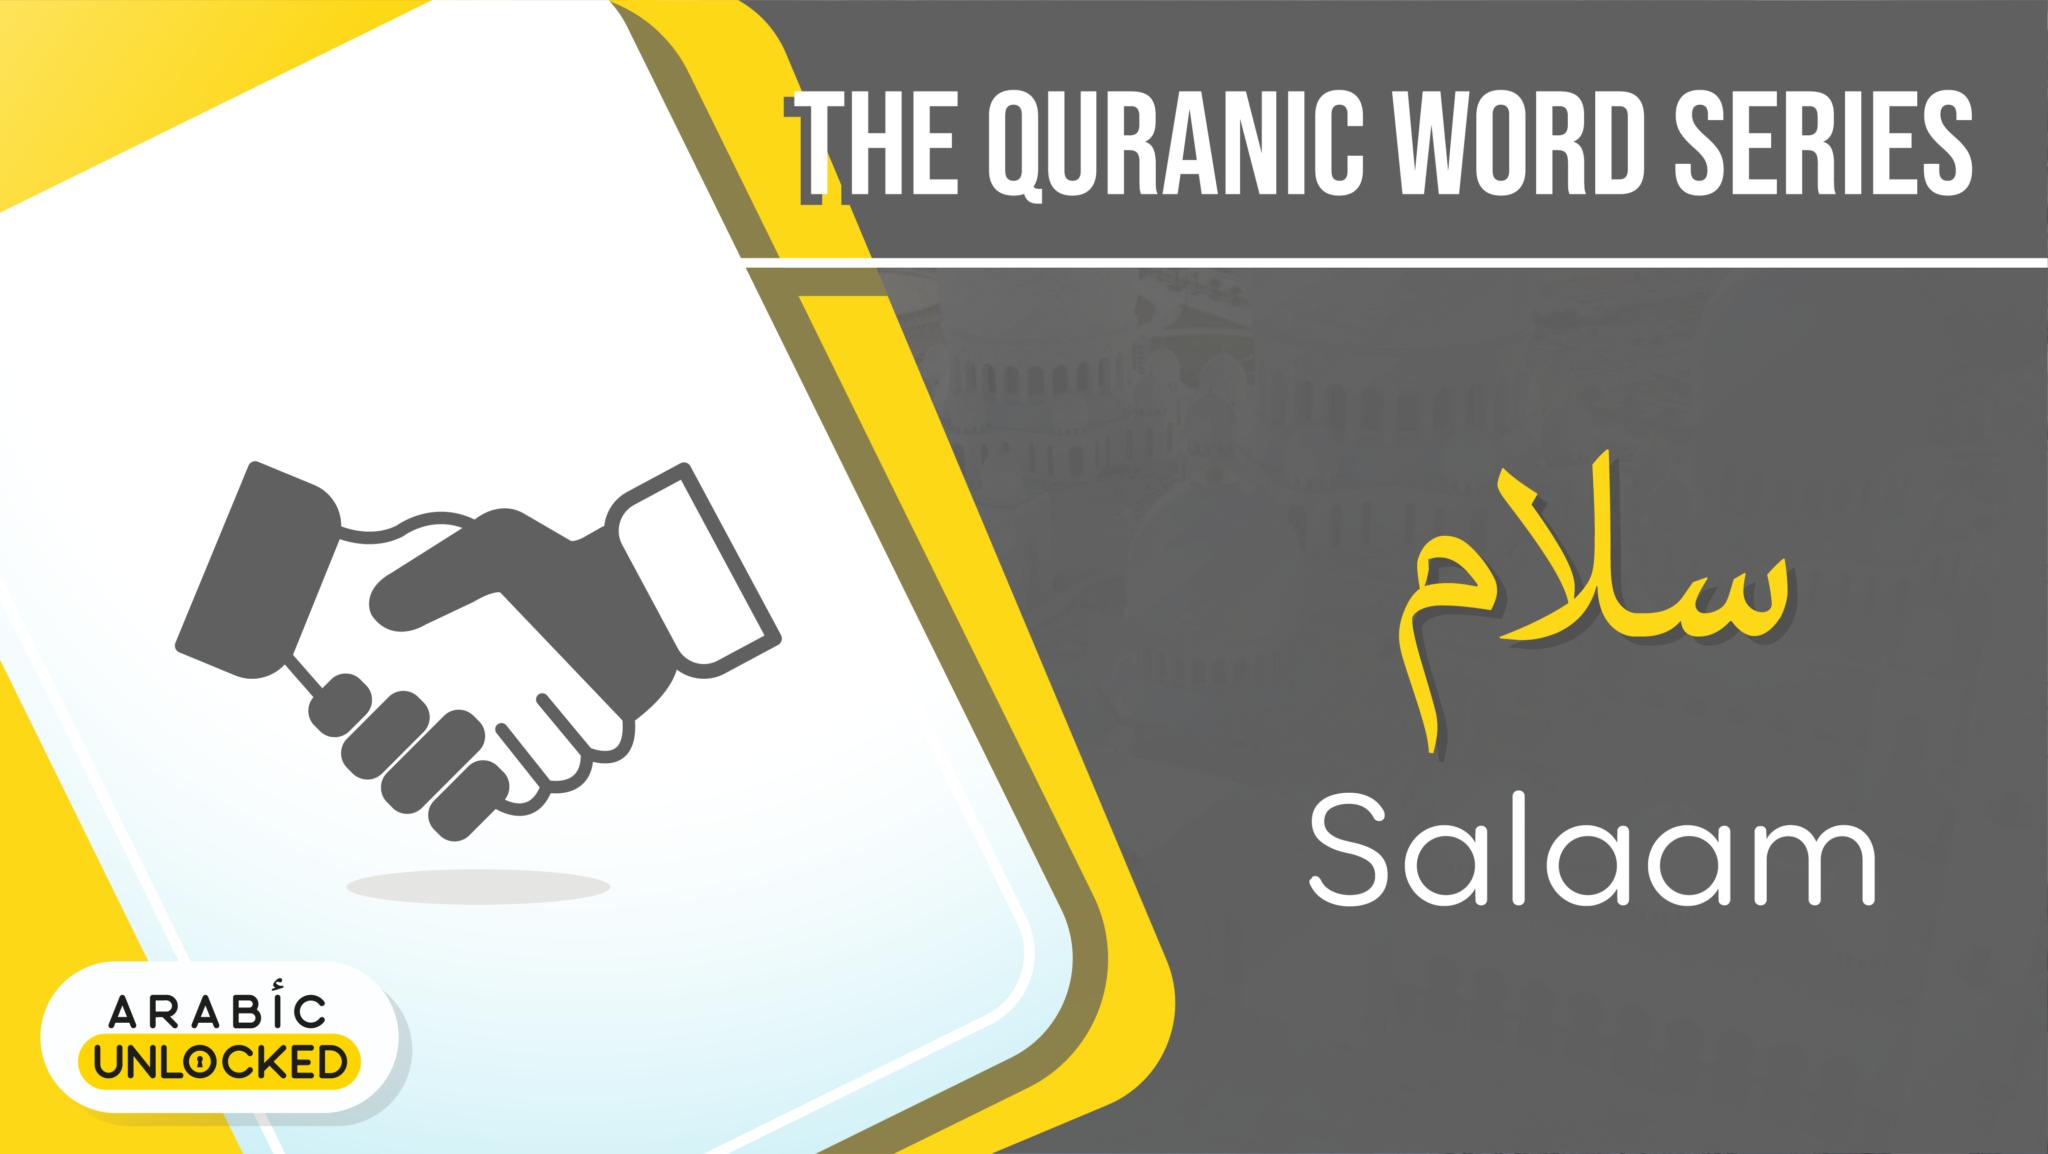 The Quranic Word Series: Salaam